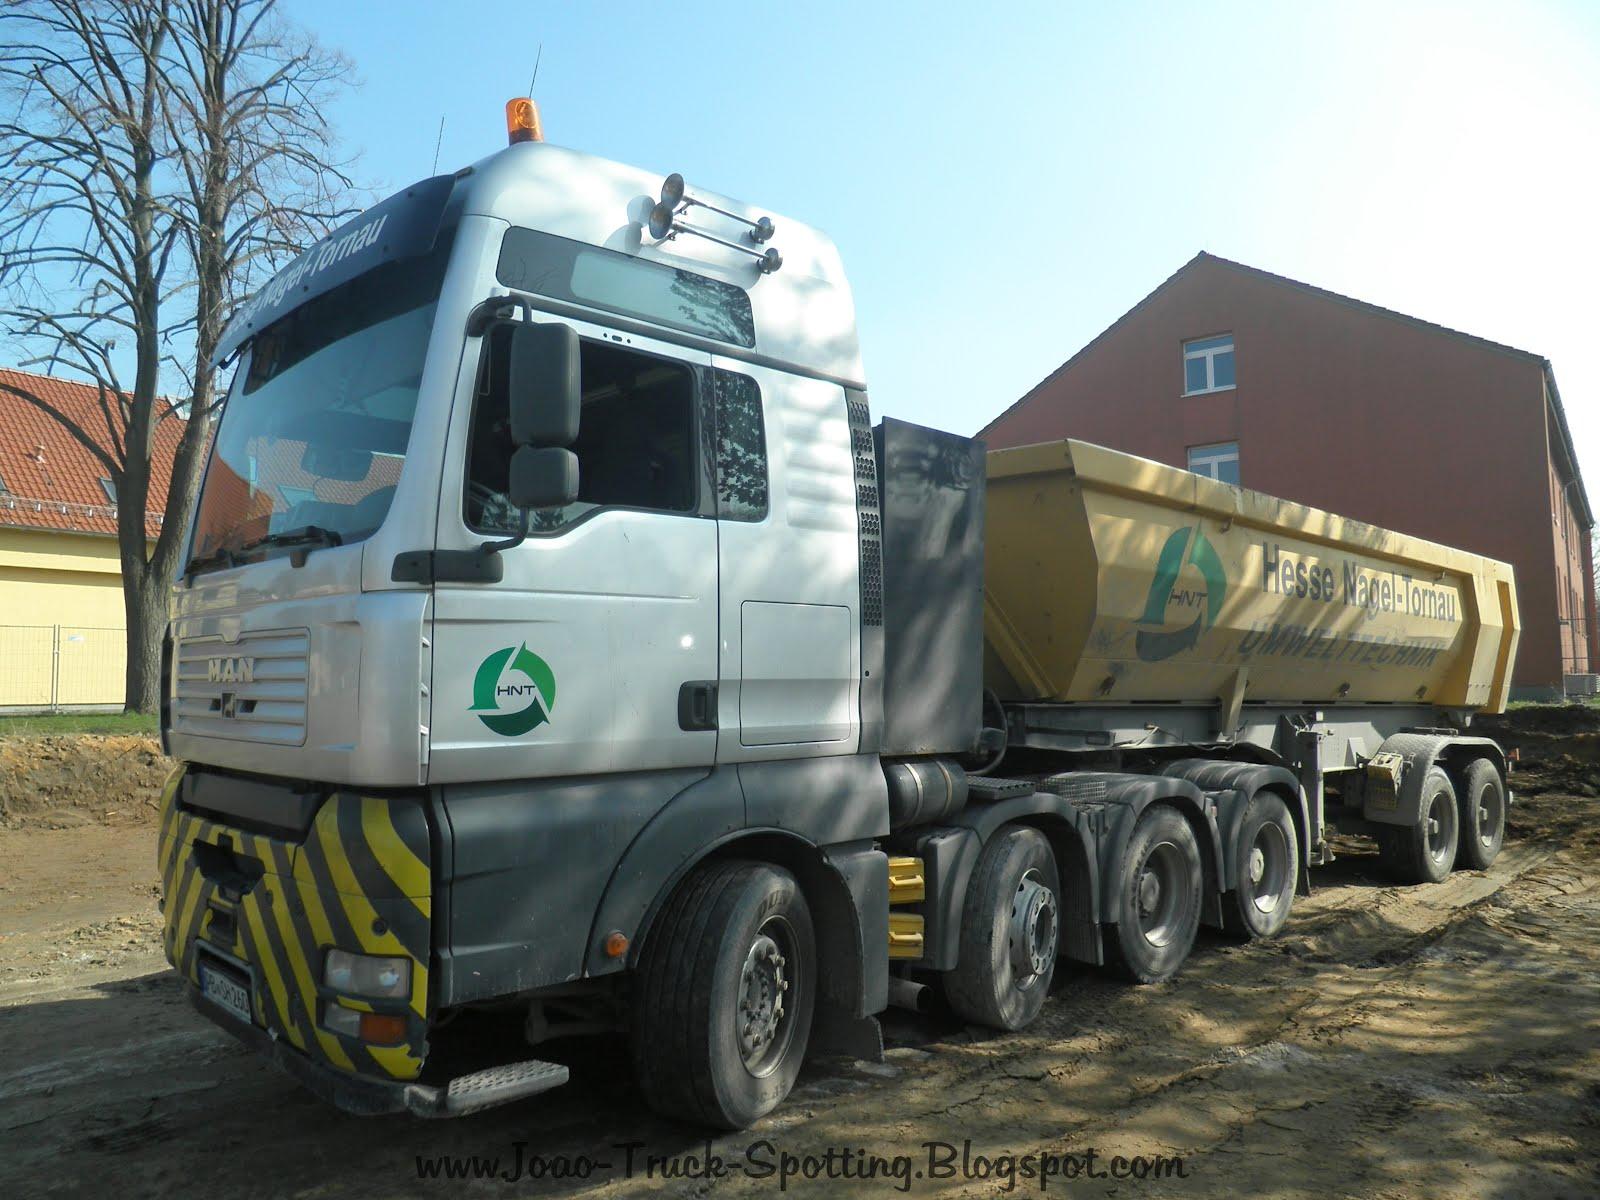 2 Axle Truck : João laurentino truck spotting hesse nagel tornau axle